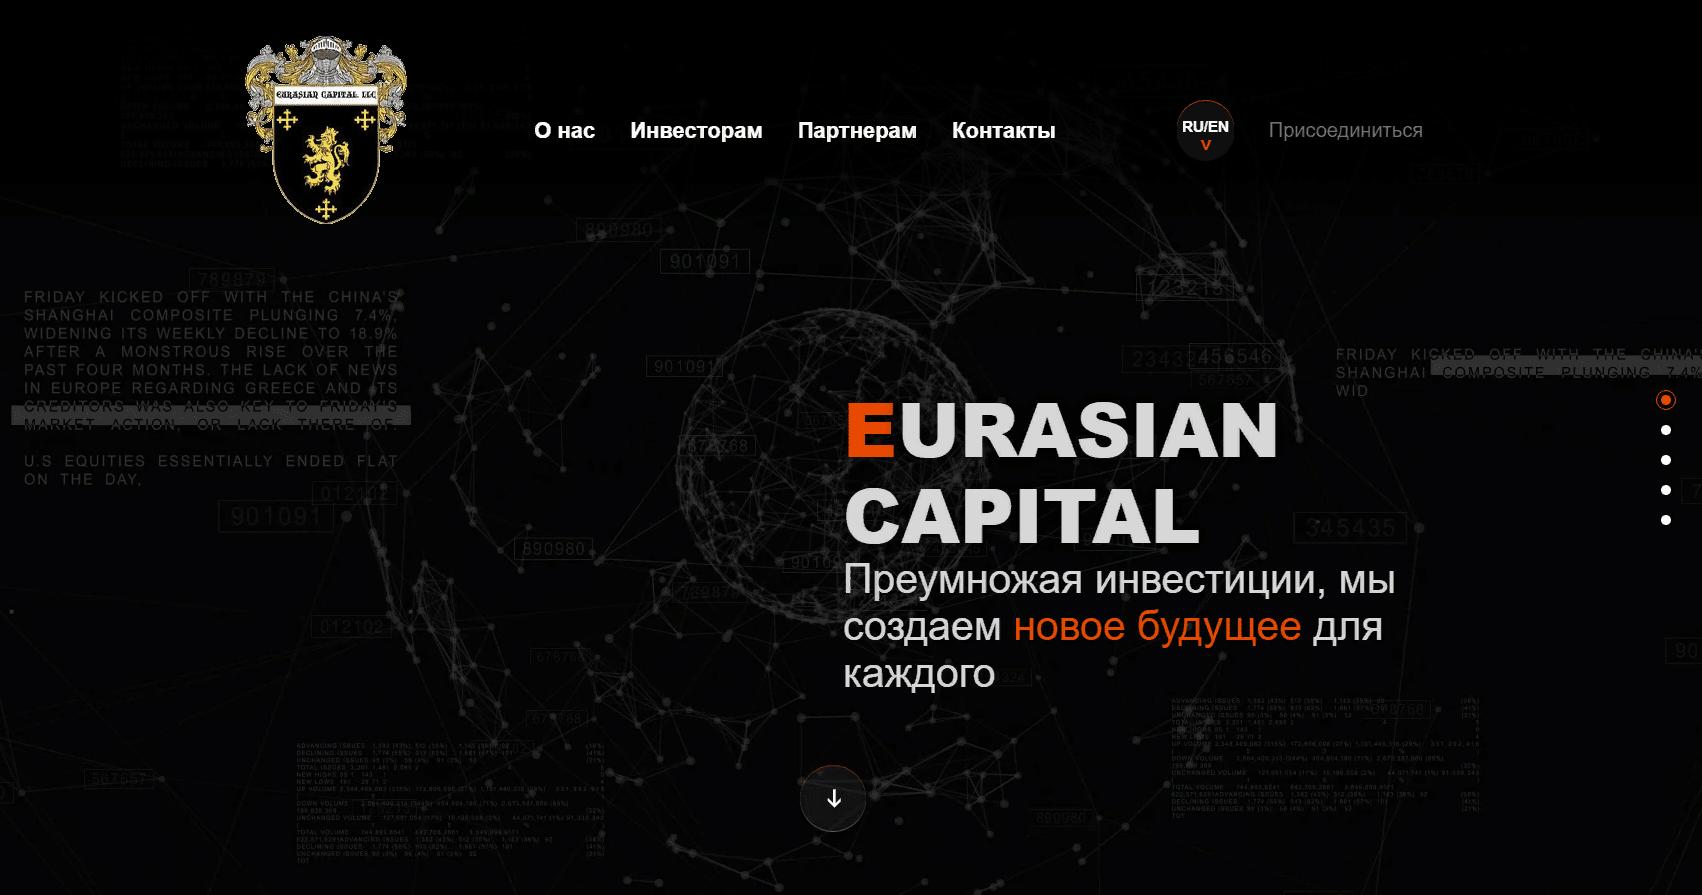 EURASIAN CAPITAL